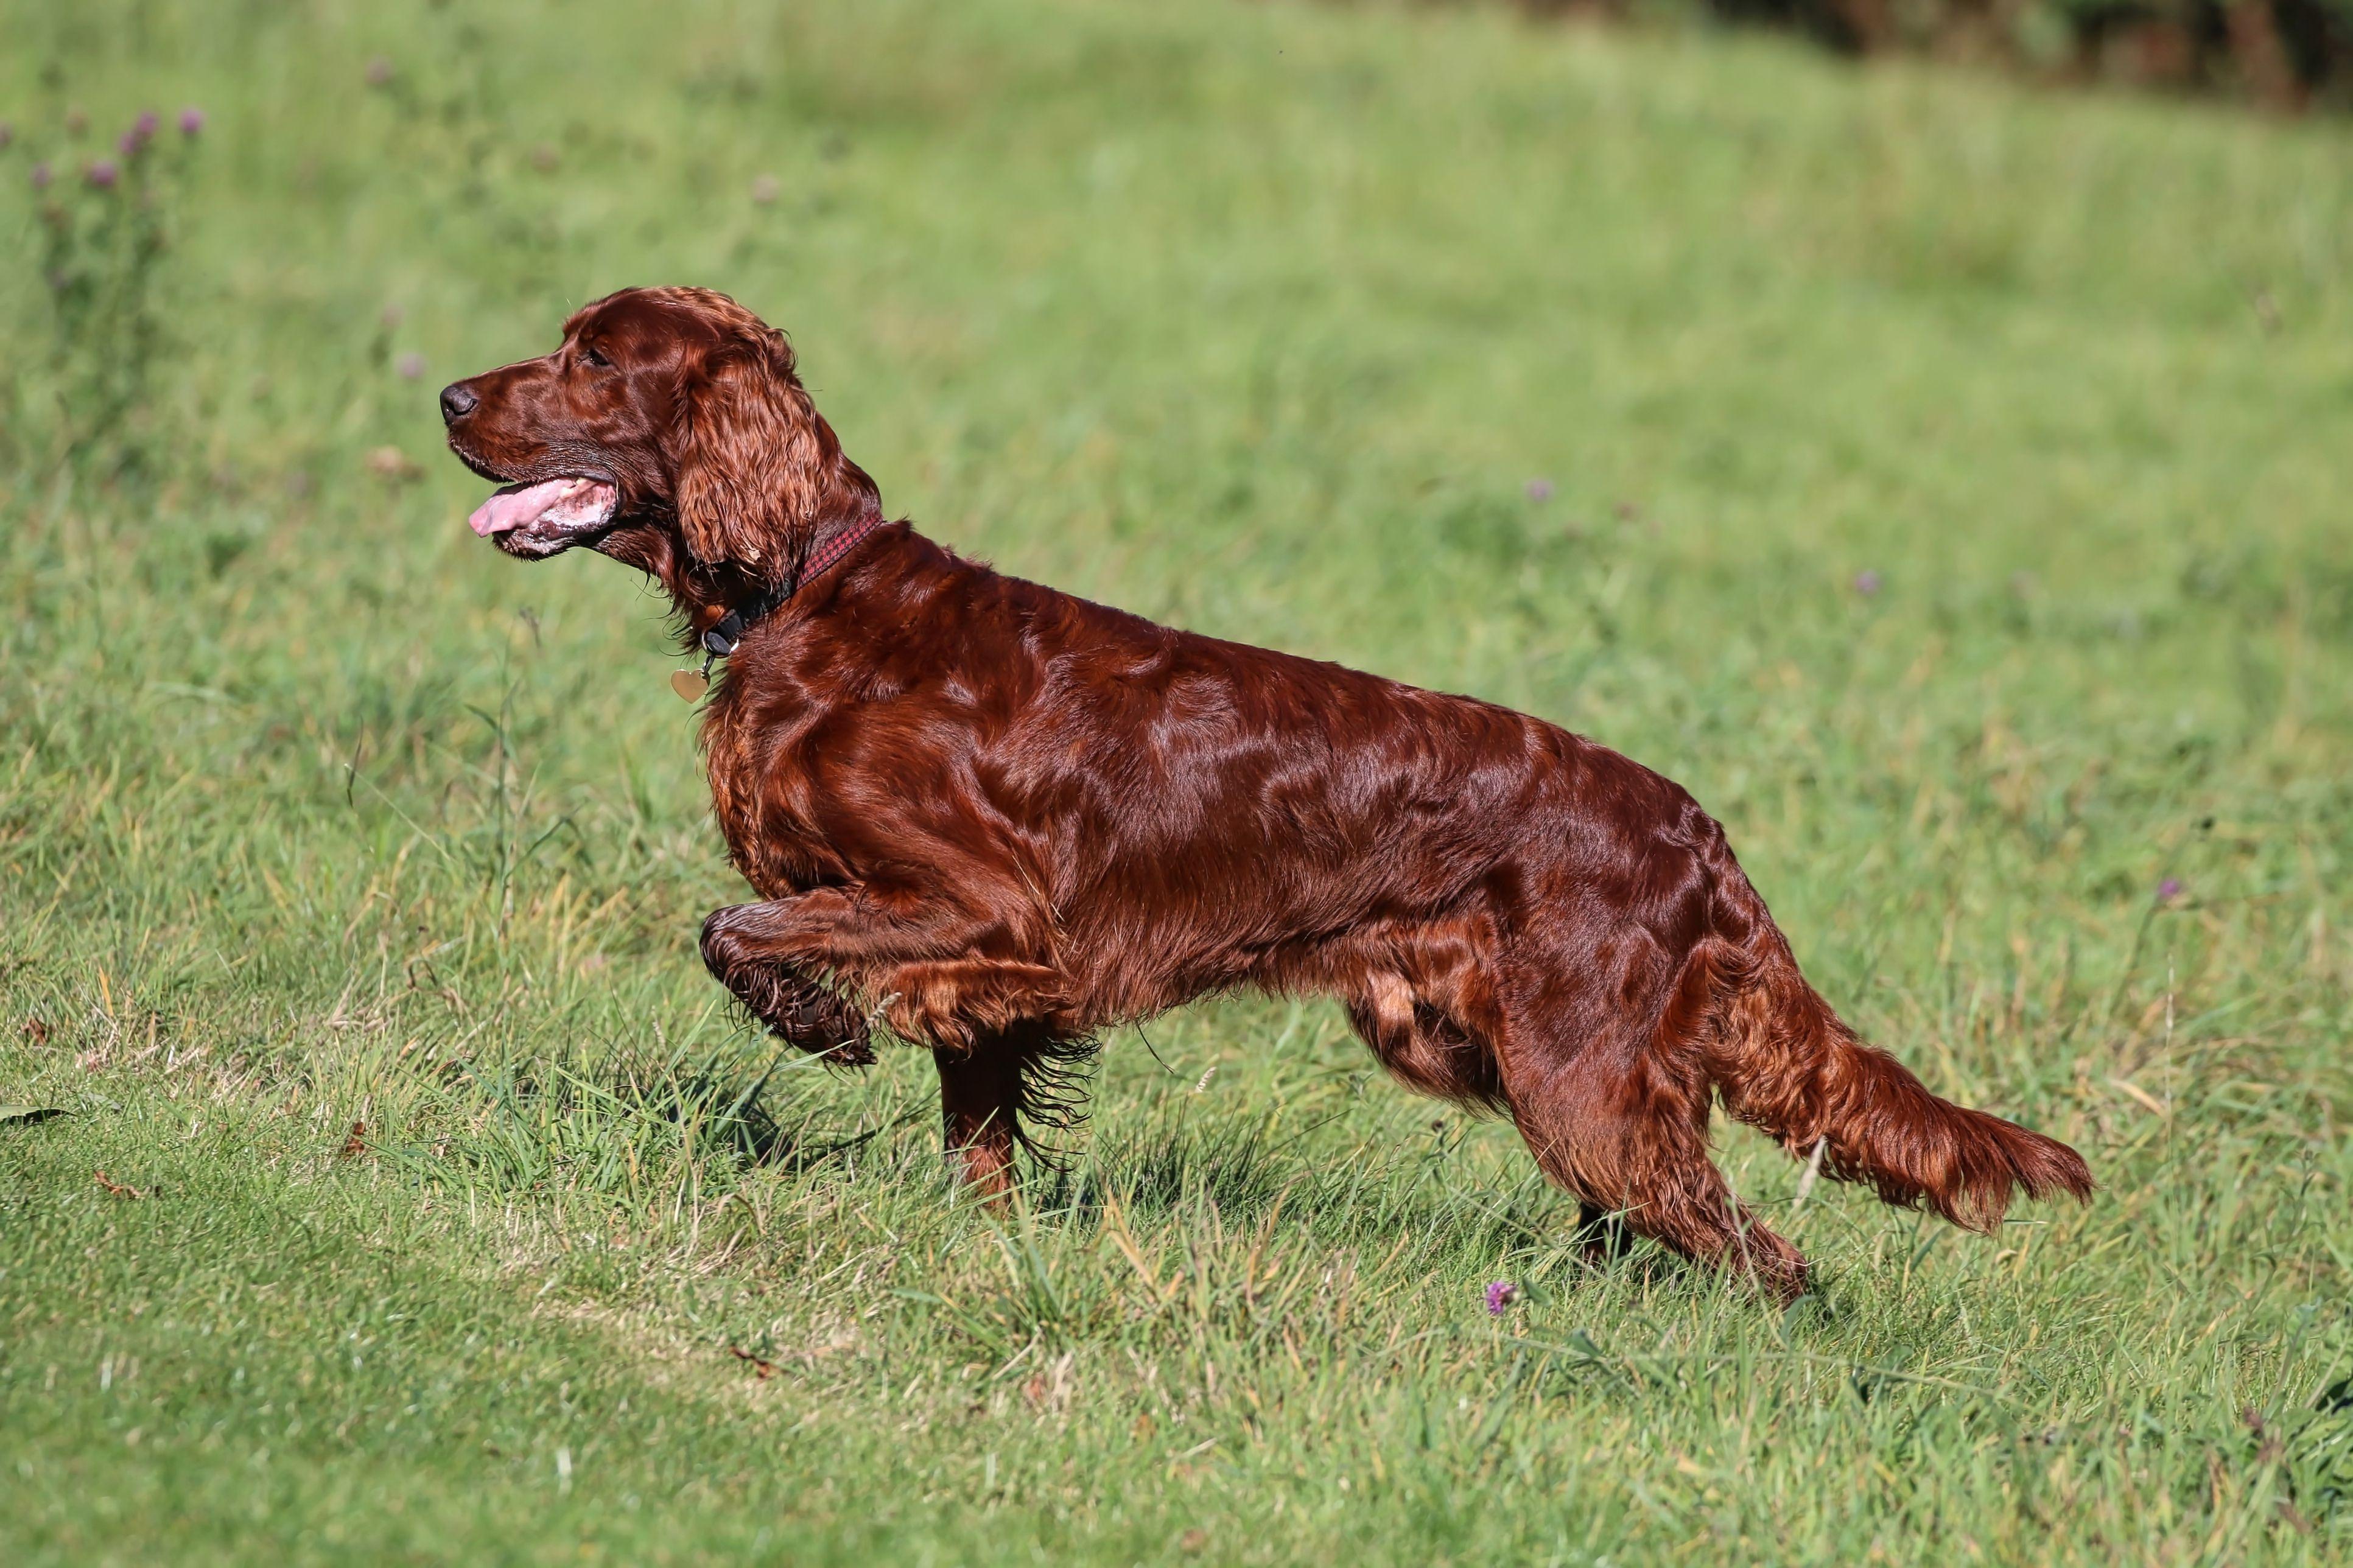 Irish setter running on grass